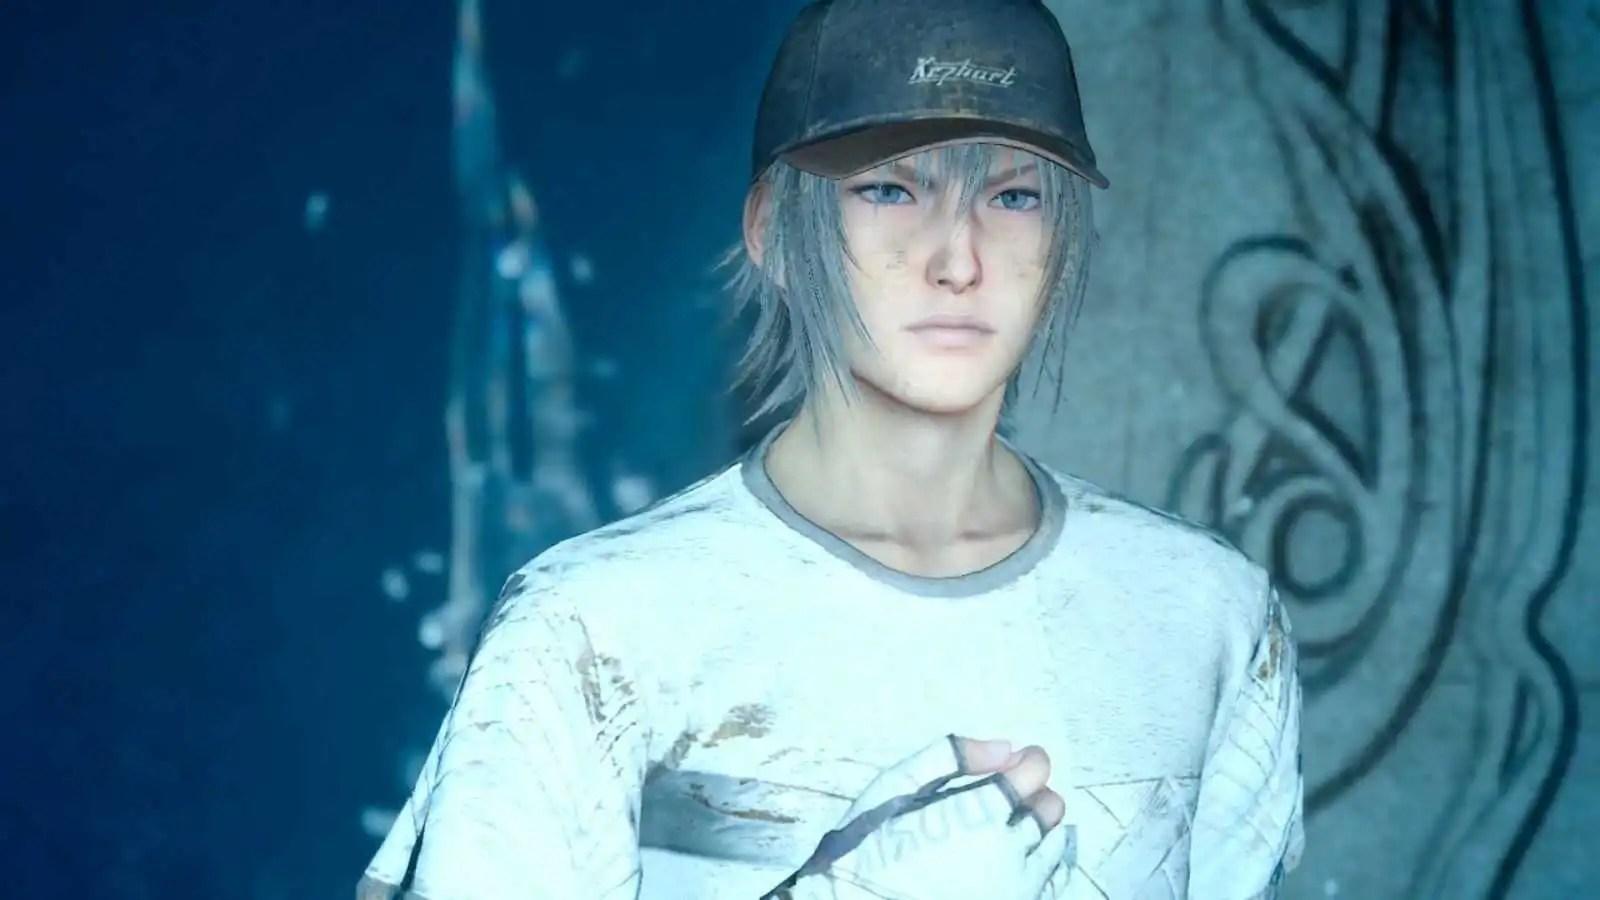 Mobius Final Fantasy sbarca su PC tramite Steam in Giappone